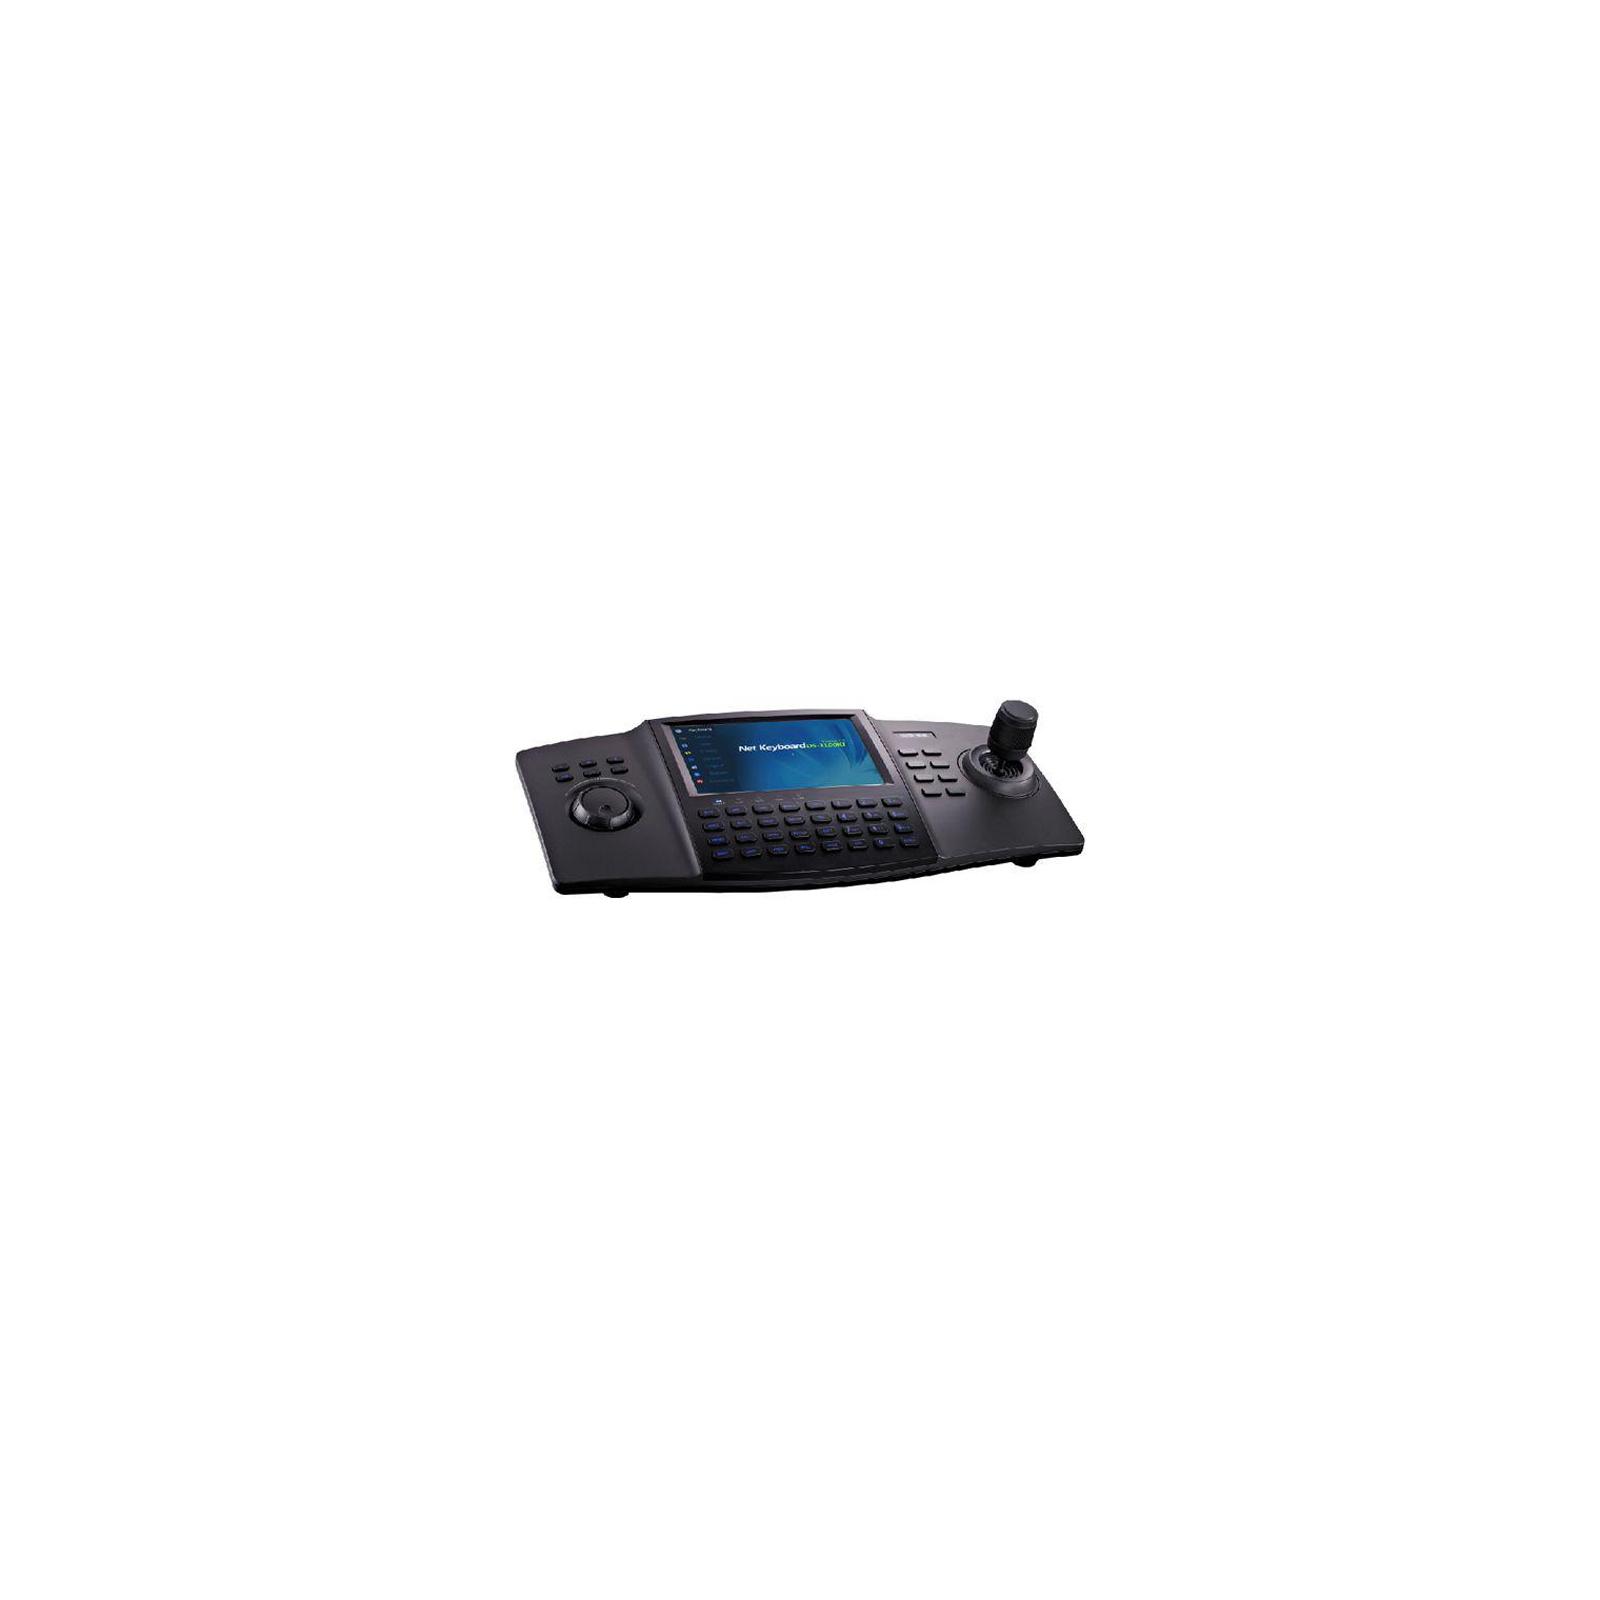 Пульт ДУ для фото- видеокамер Hikvision DS-1100KI (PTZ IP) (12042)